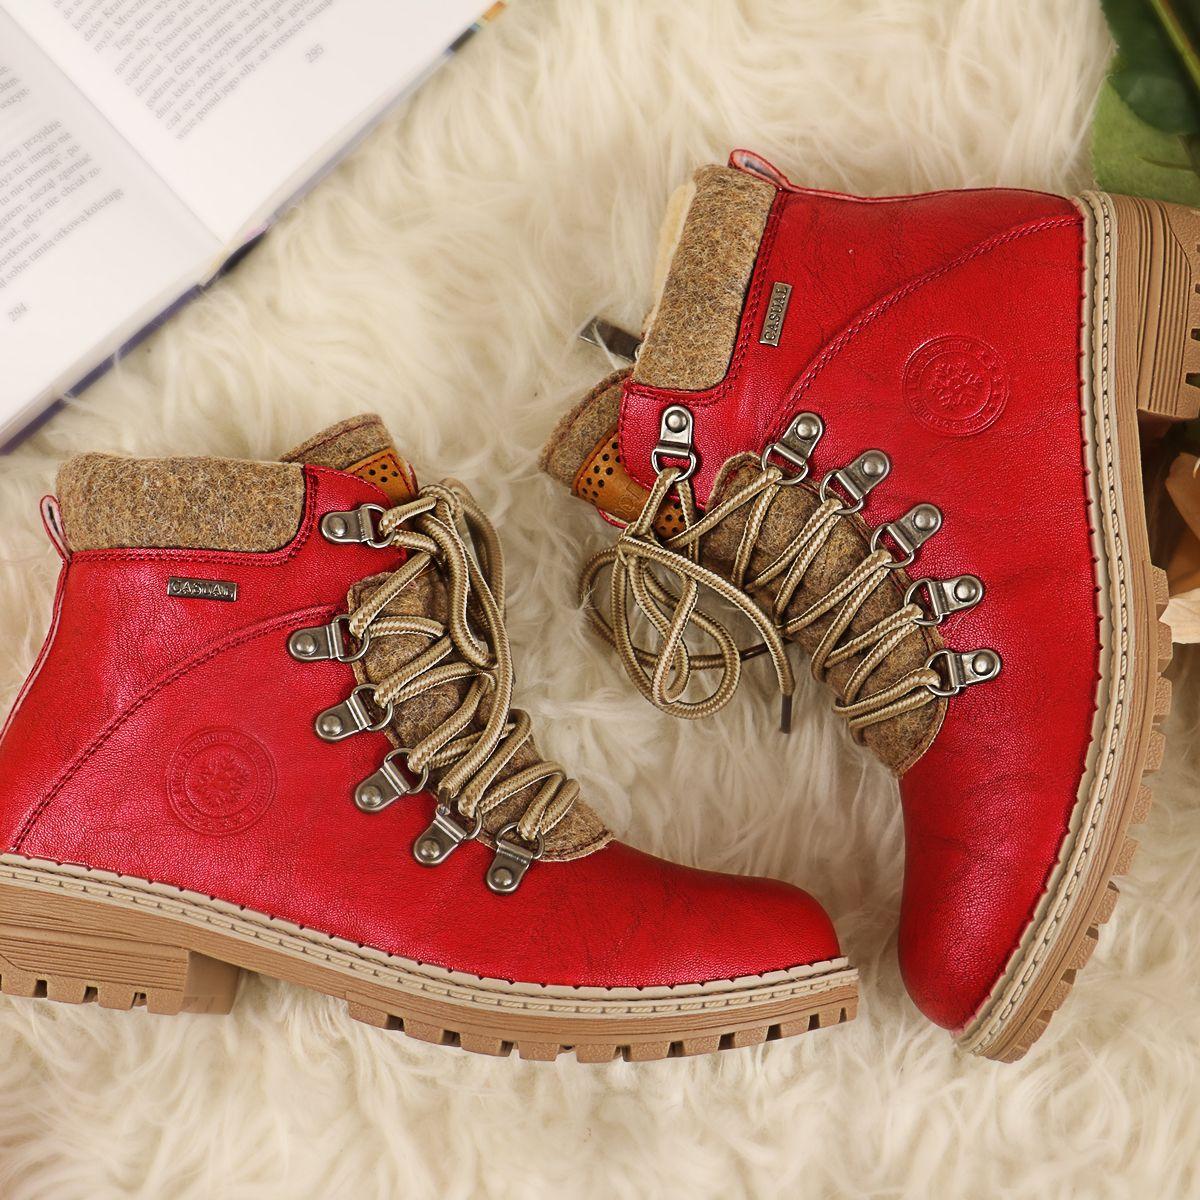 Pin By Leonka On Fotki Towarowe Warm Winter Winter Timberland Boots